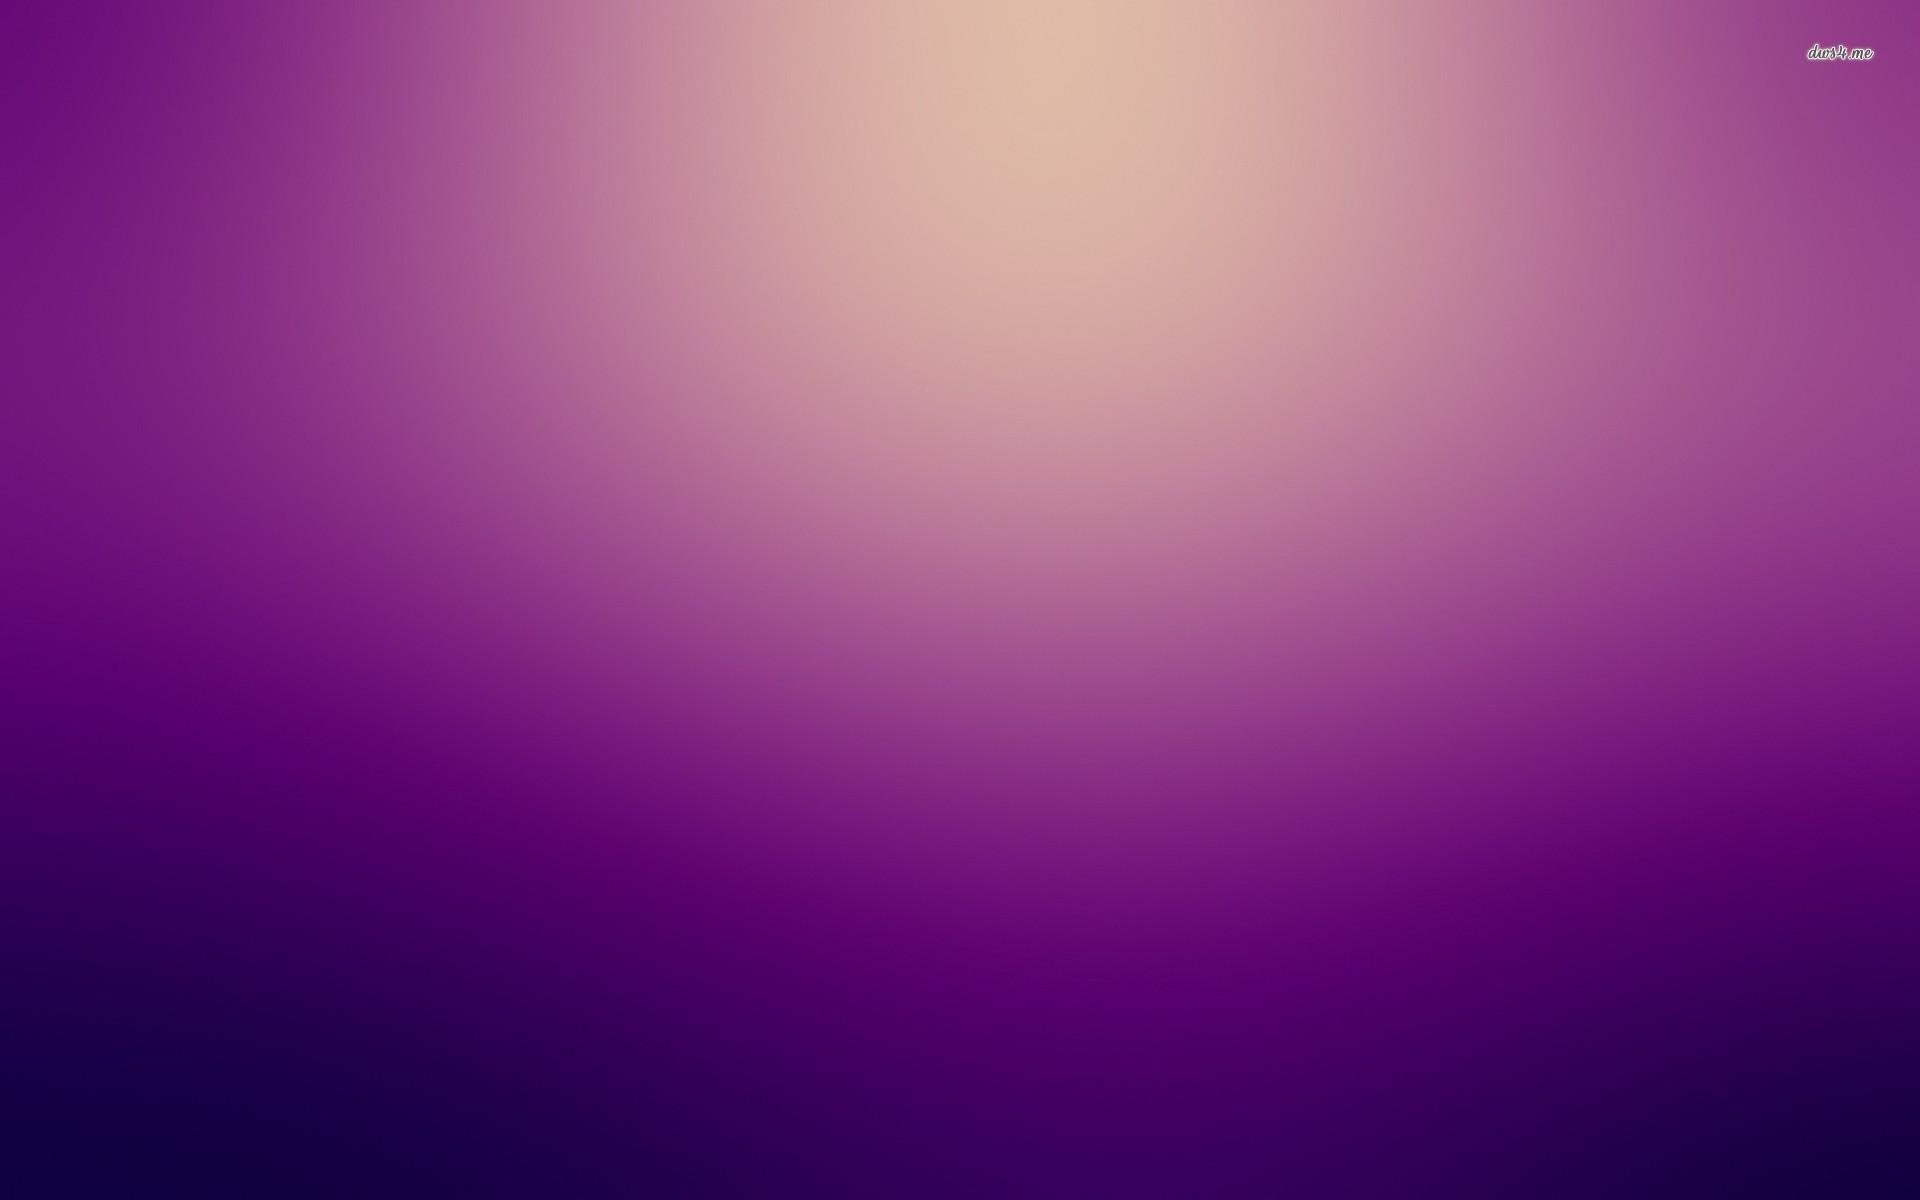 Purple Color Gradient A Purple Gradient Background Hd 1920x1200 Wallpaper Teahub Io